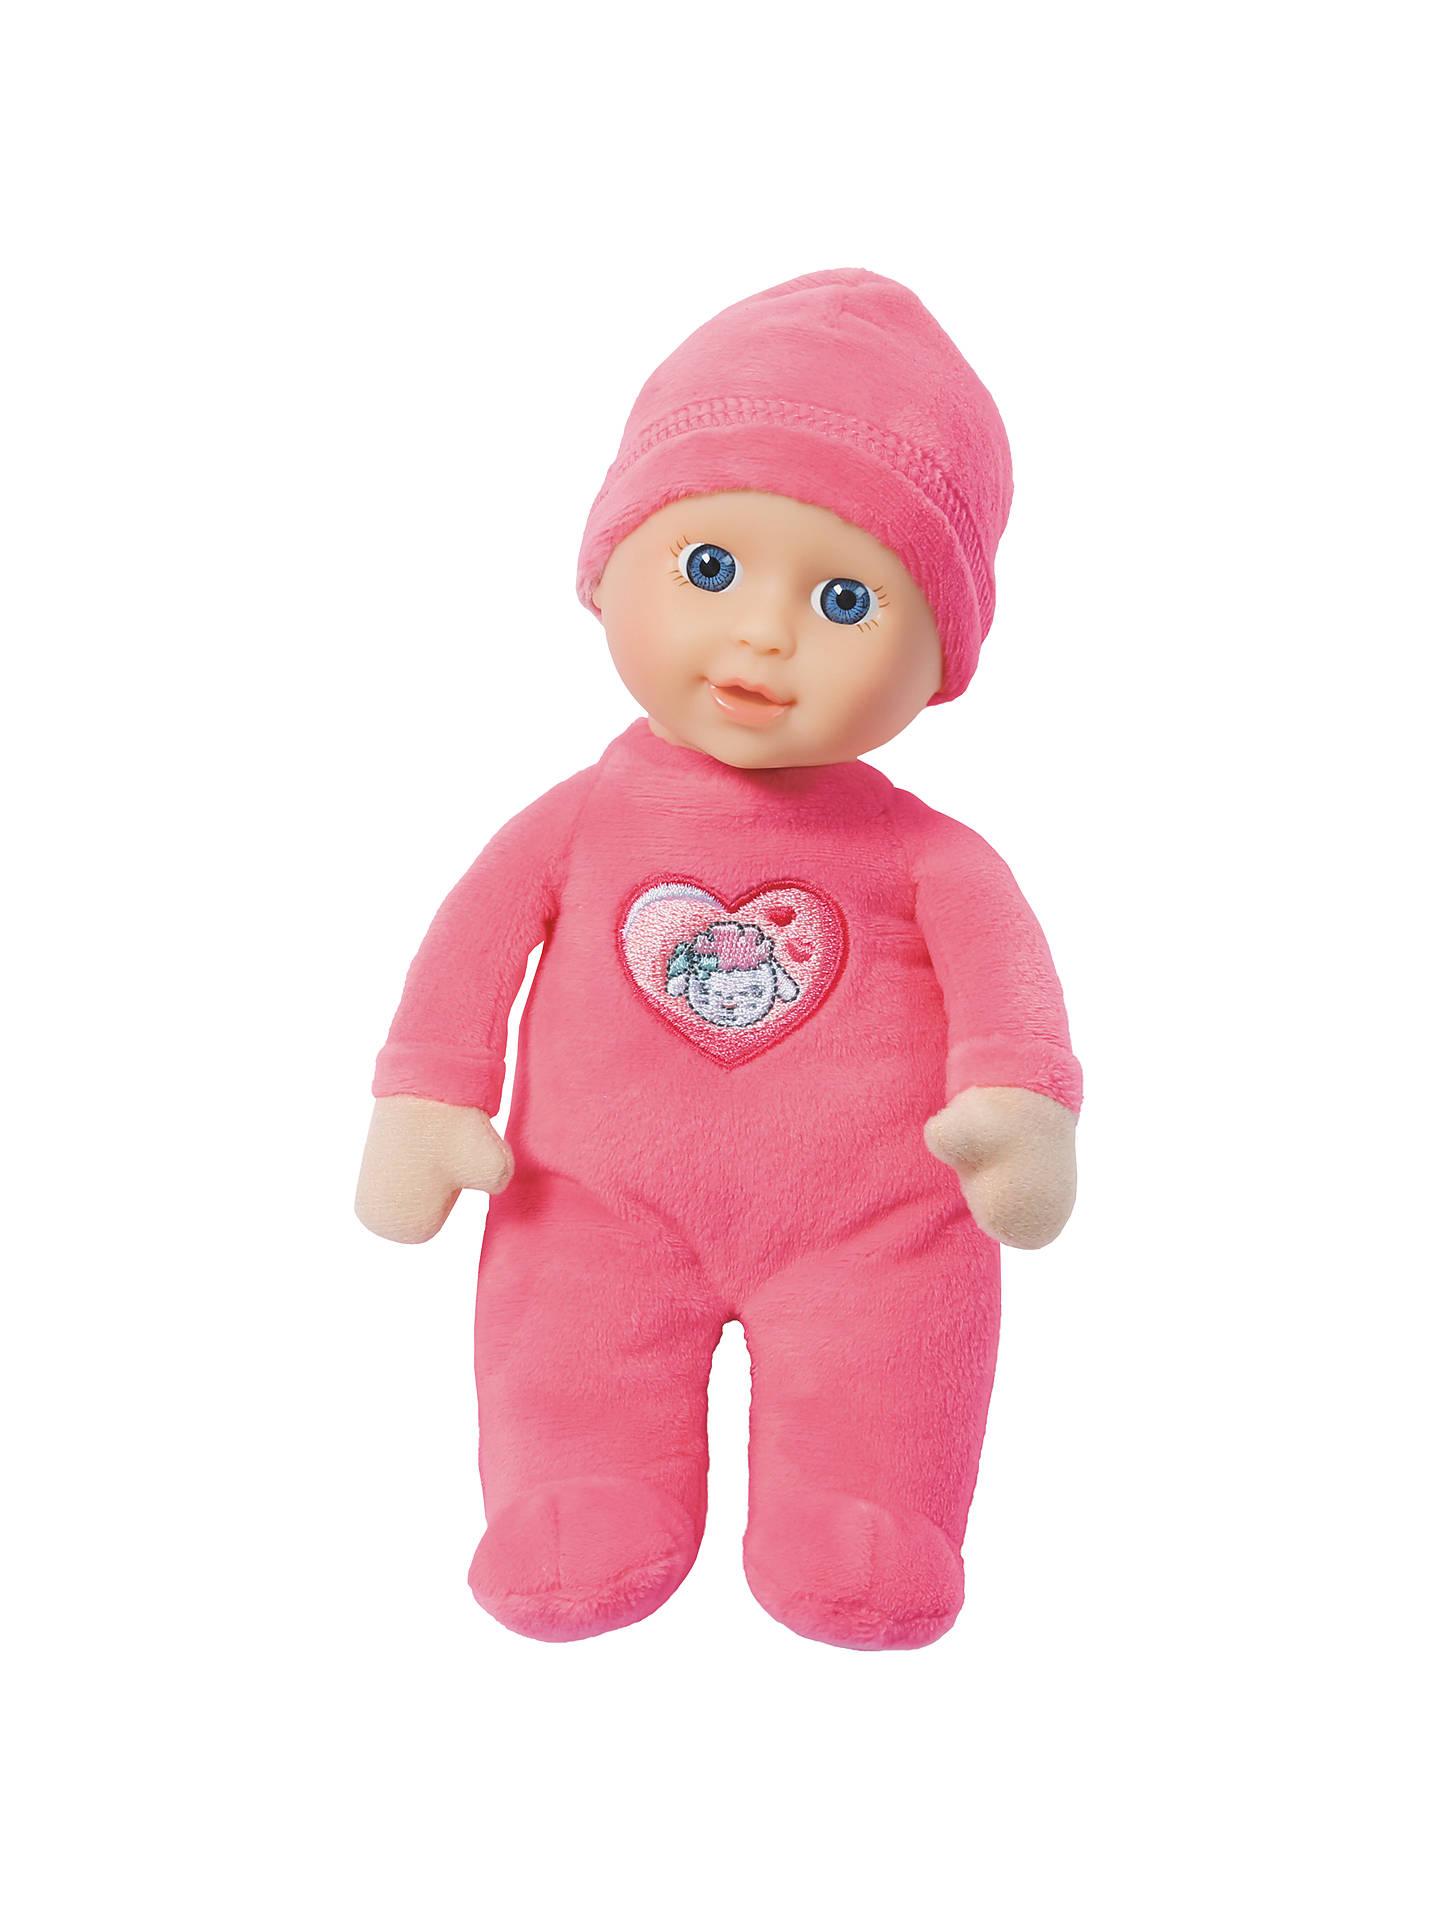 Baby Annabell Newborn 22cm Baby Doll at John Lewis & Partners